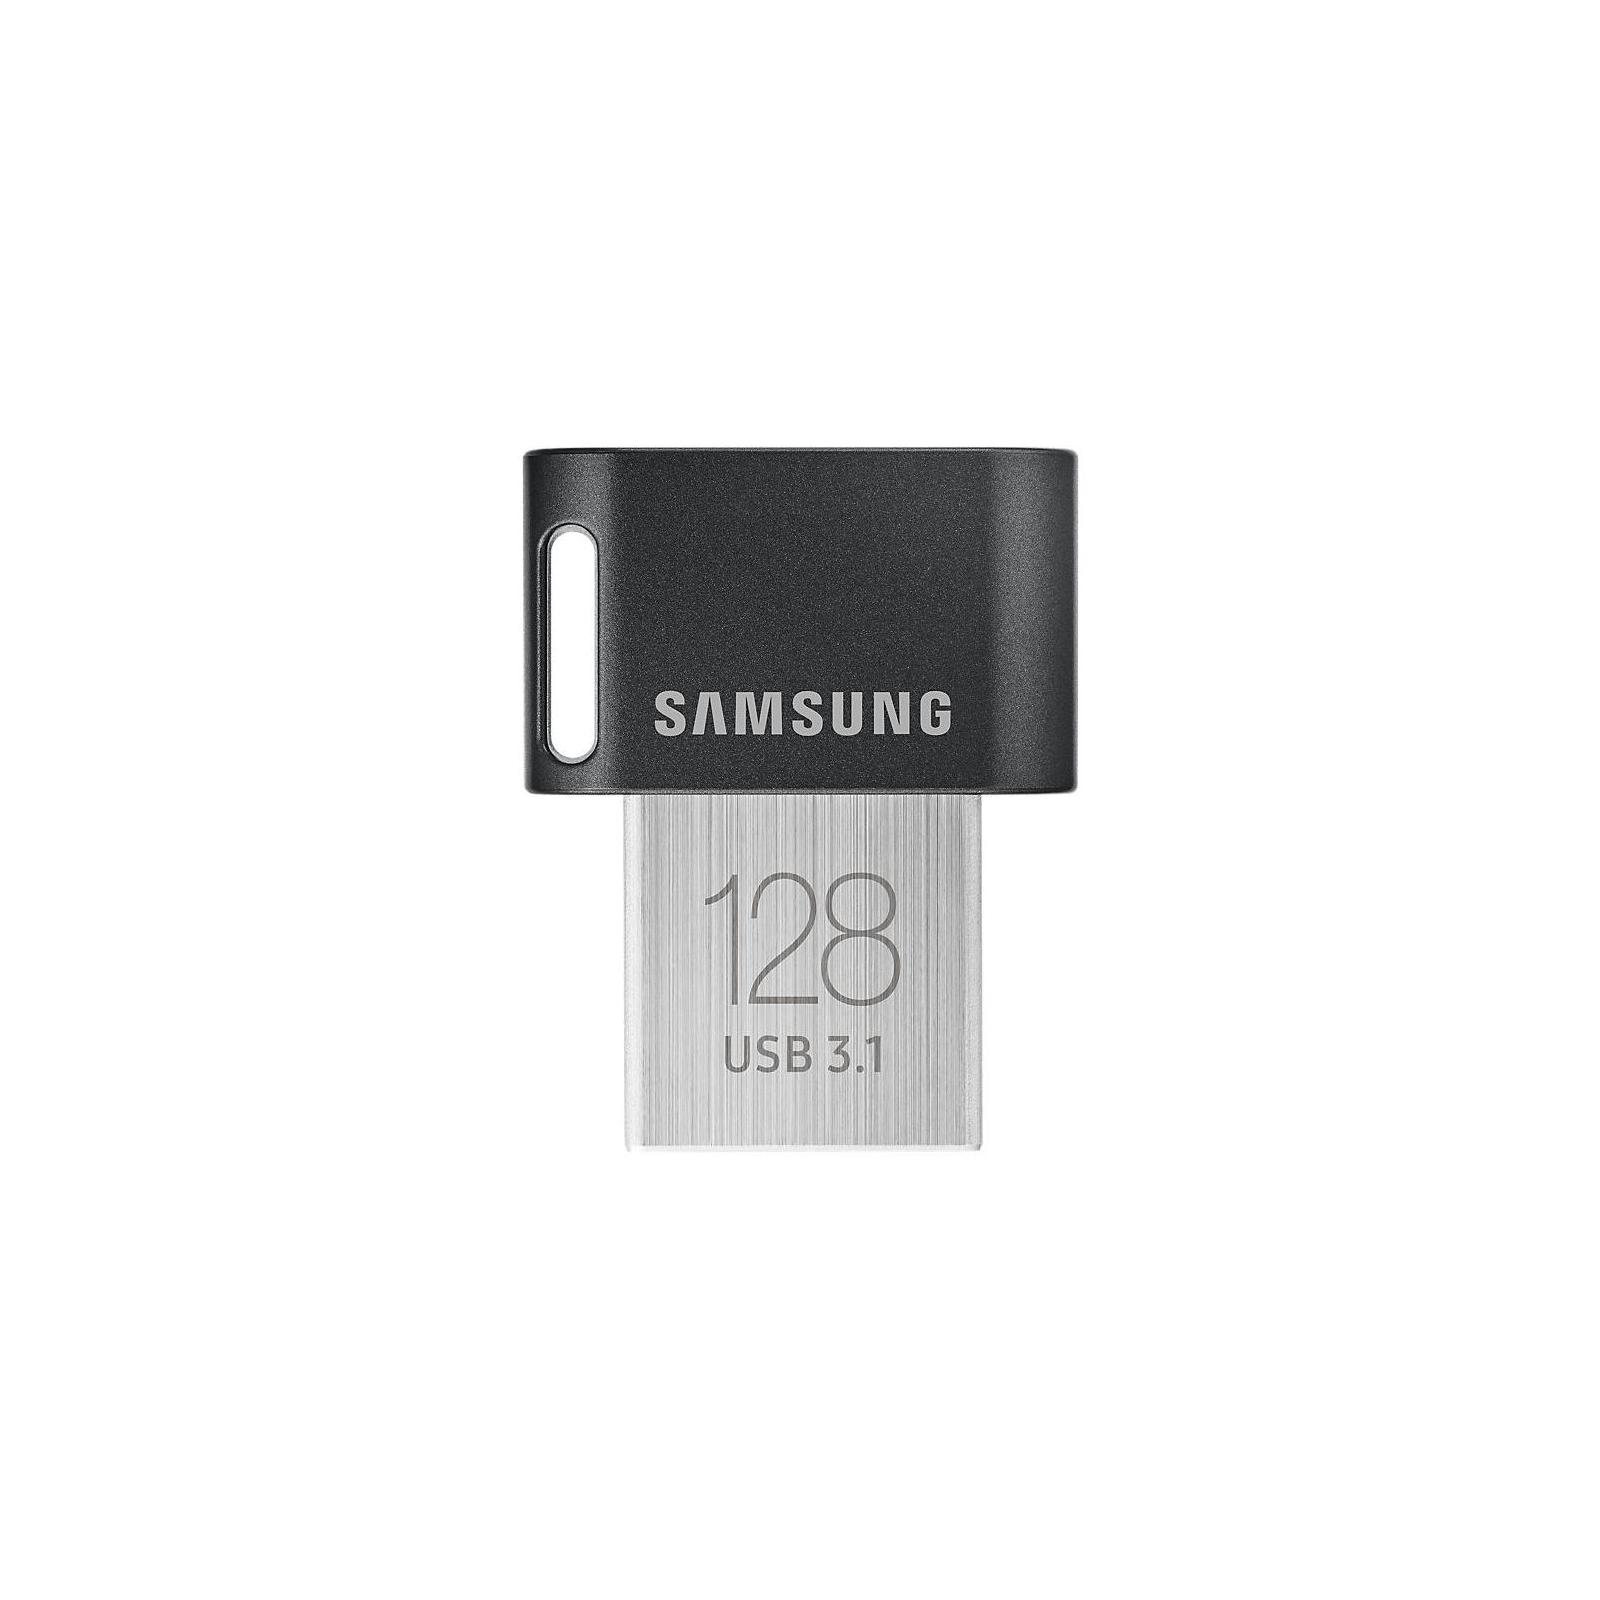 USB флеш накопитель Samsung 64GB Fit Plus USB 3.0 (MUF-64AB/APC)